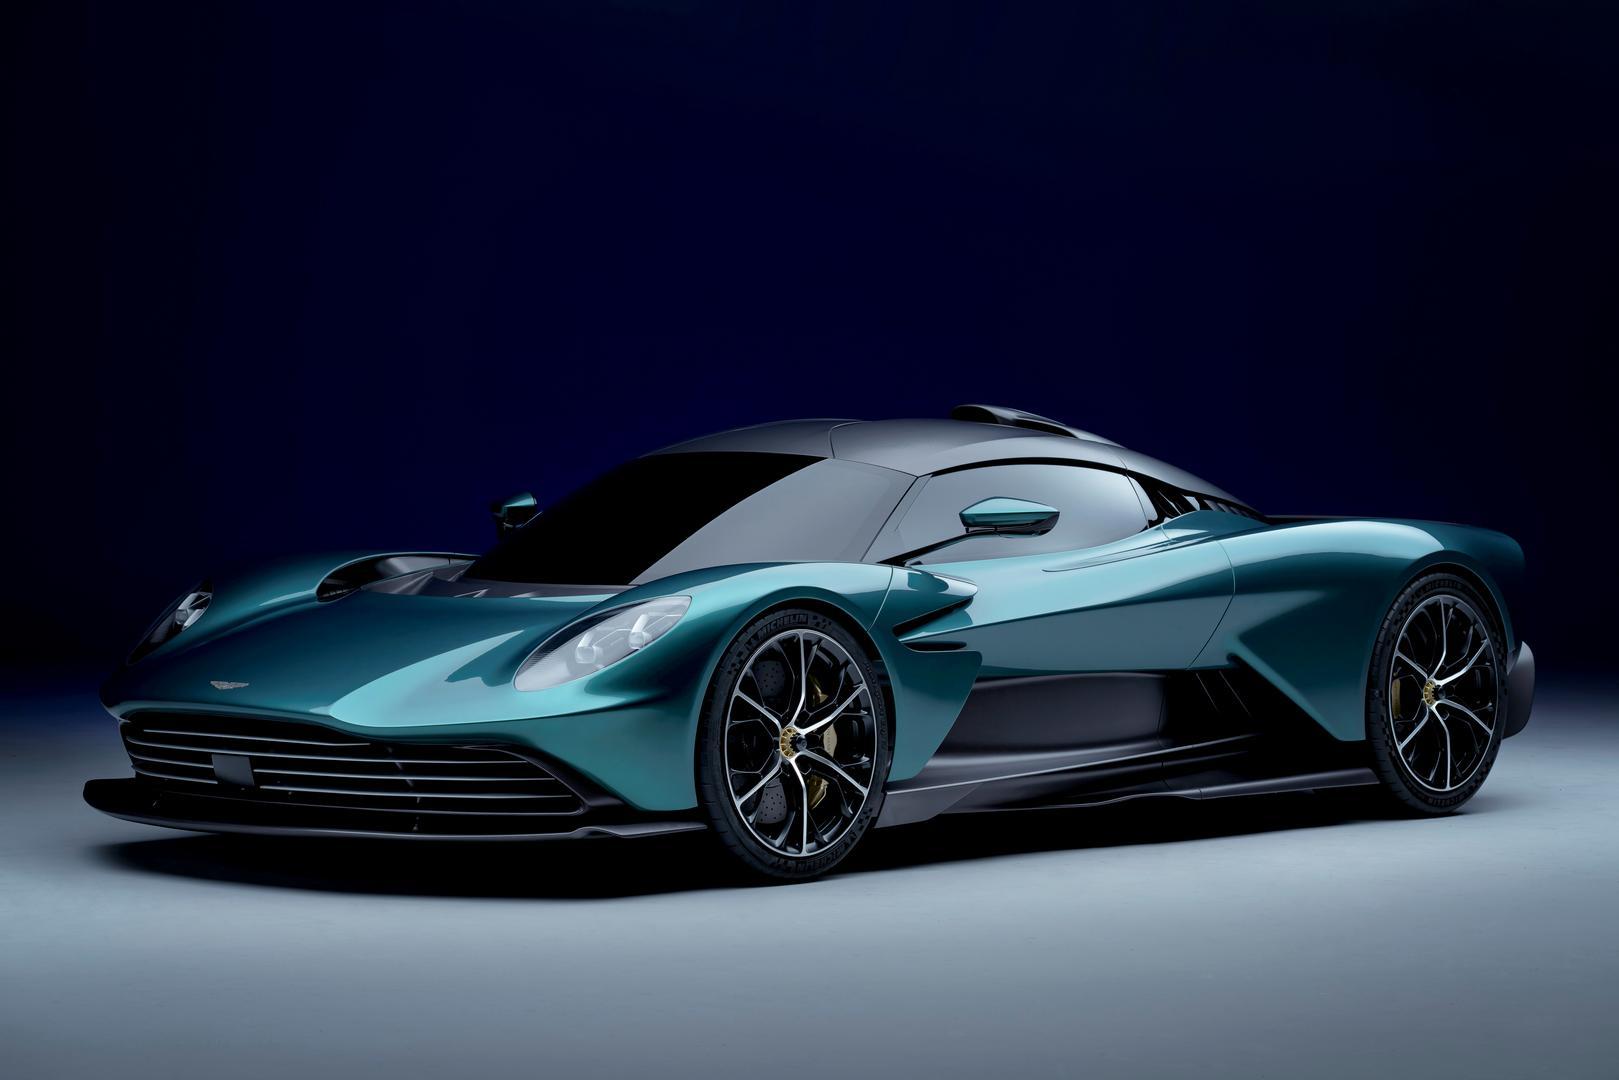 Aston Martin Valhalla Revealed in Production Form: V8 Hybrid Replaces V6